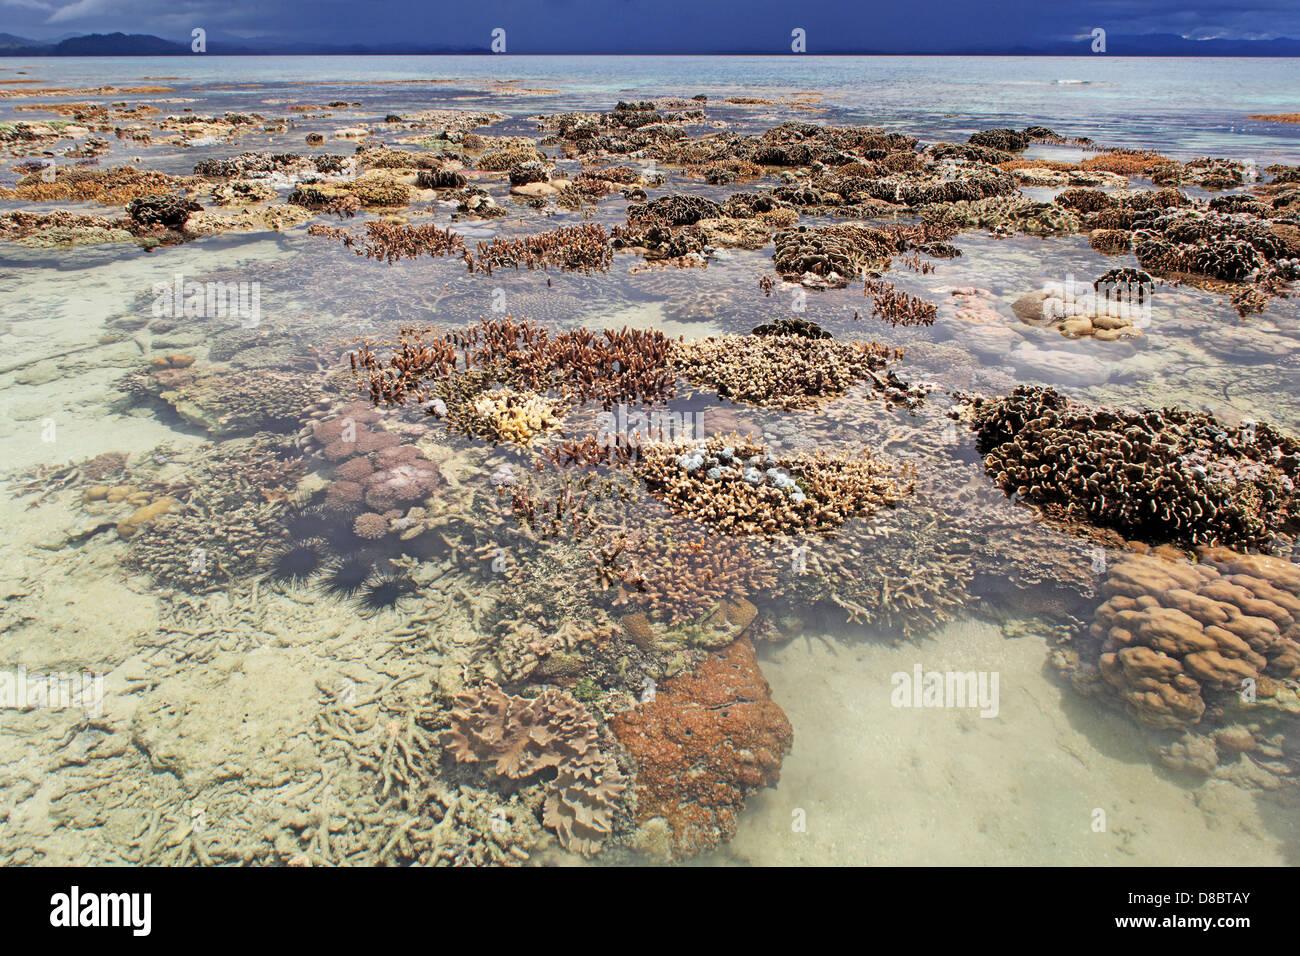 coral reef at Bangka Island, North Sulawesi, Indonesia - Stock Image